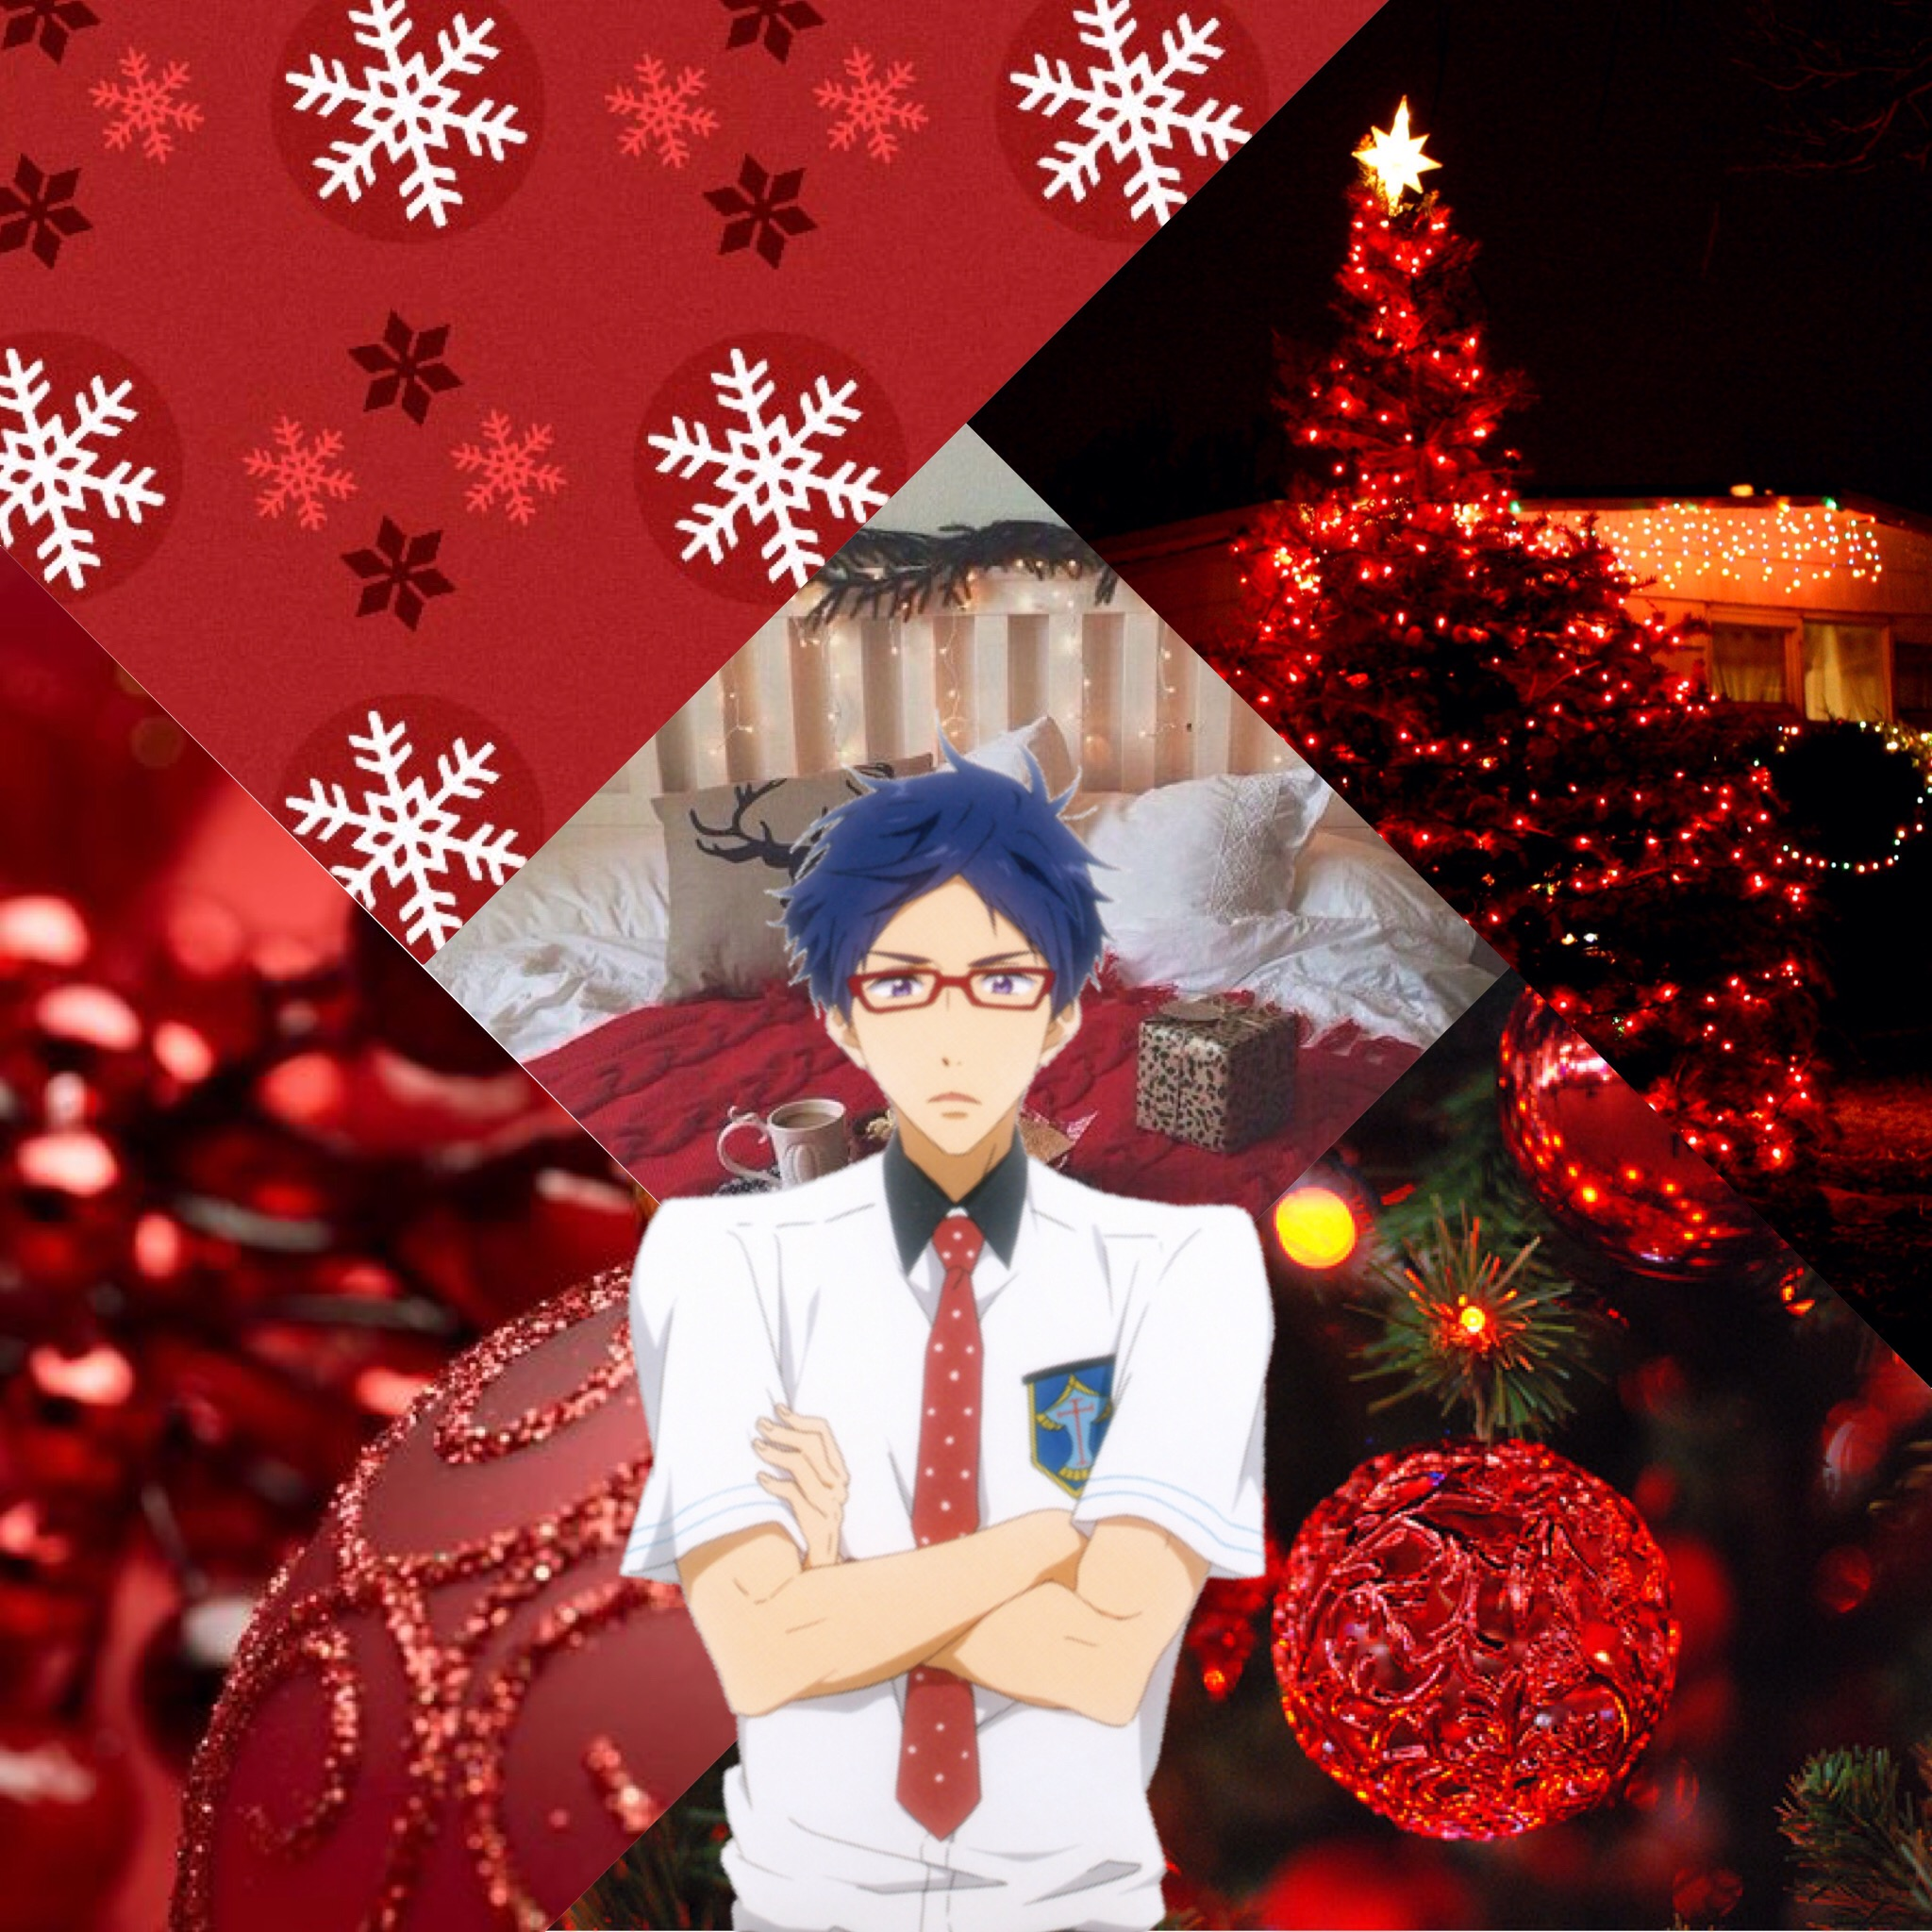 Christmas Wallpaper Aesthetic: Merry Christmas! ️ Christmas Anime Aesthetic Red Tumbl